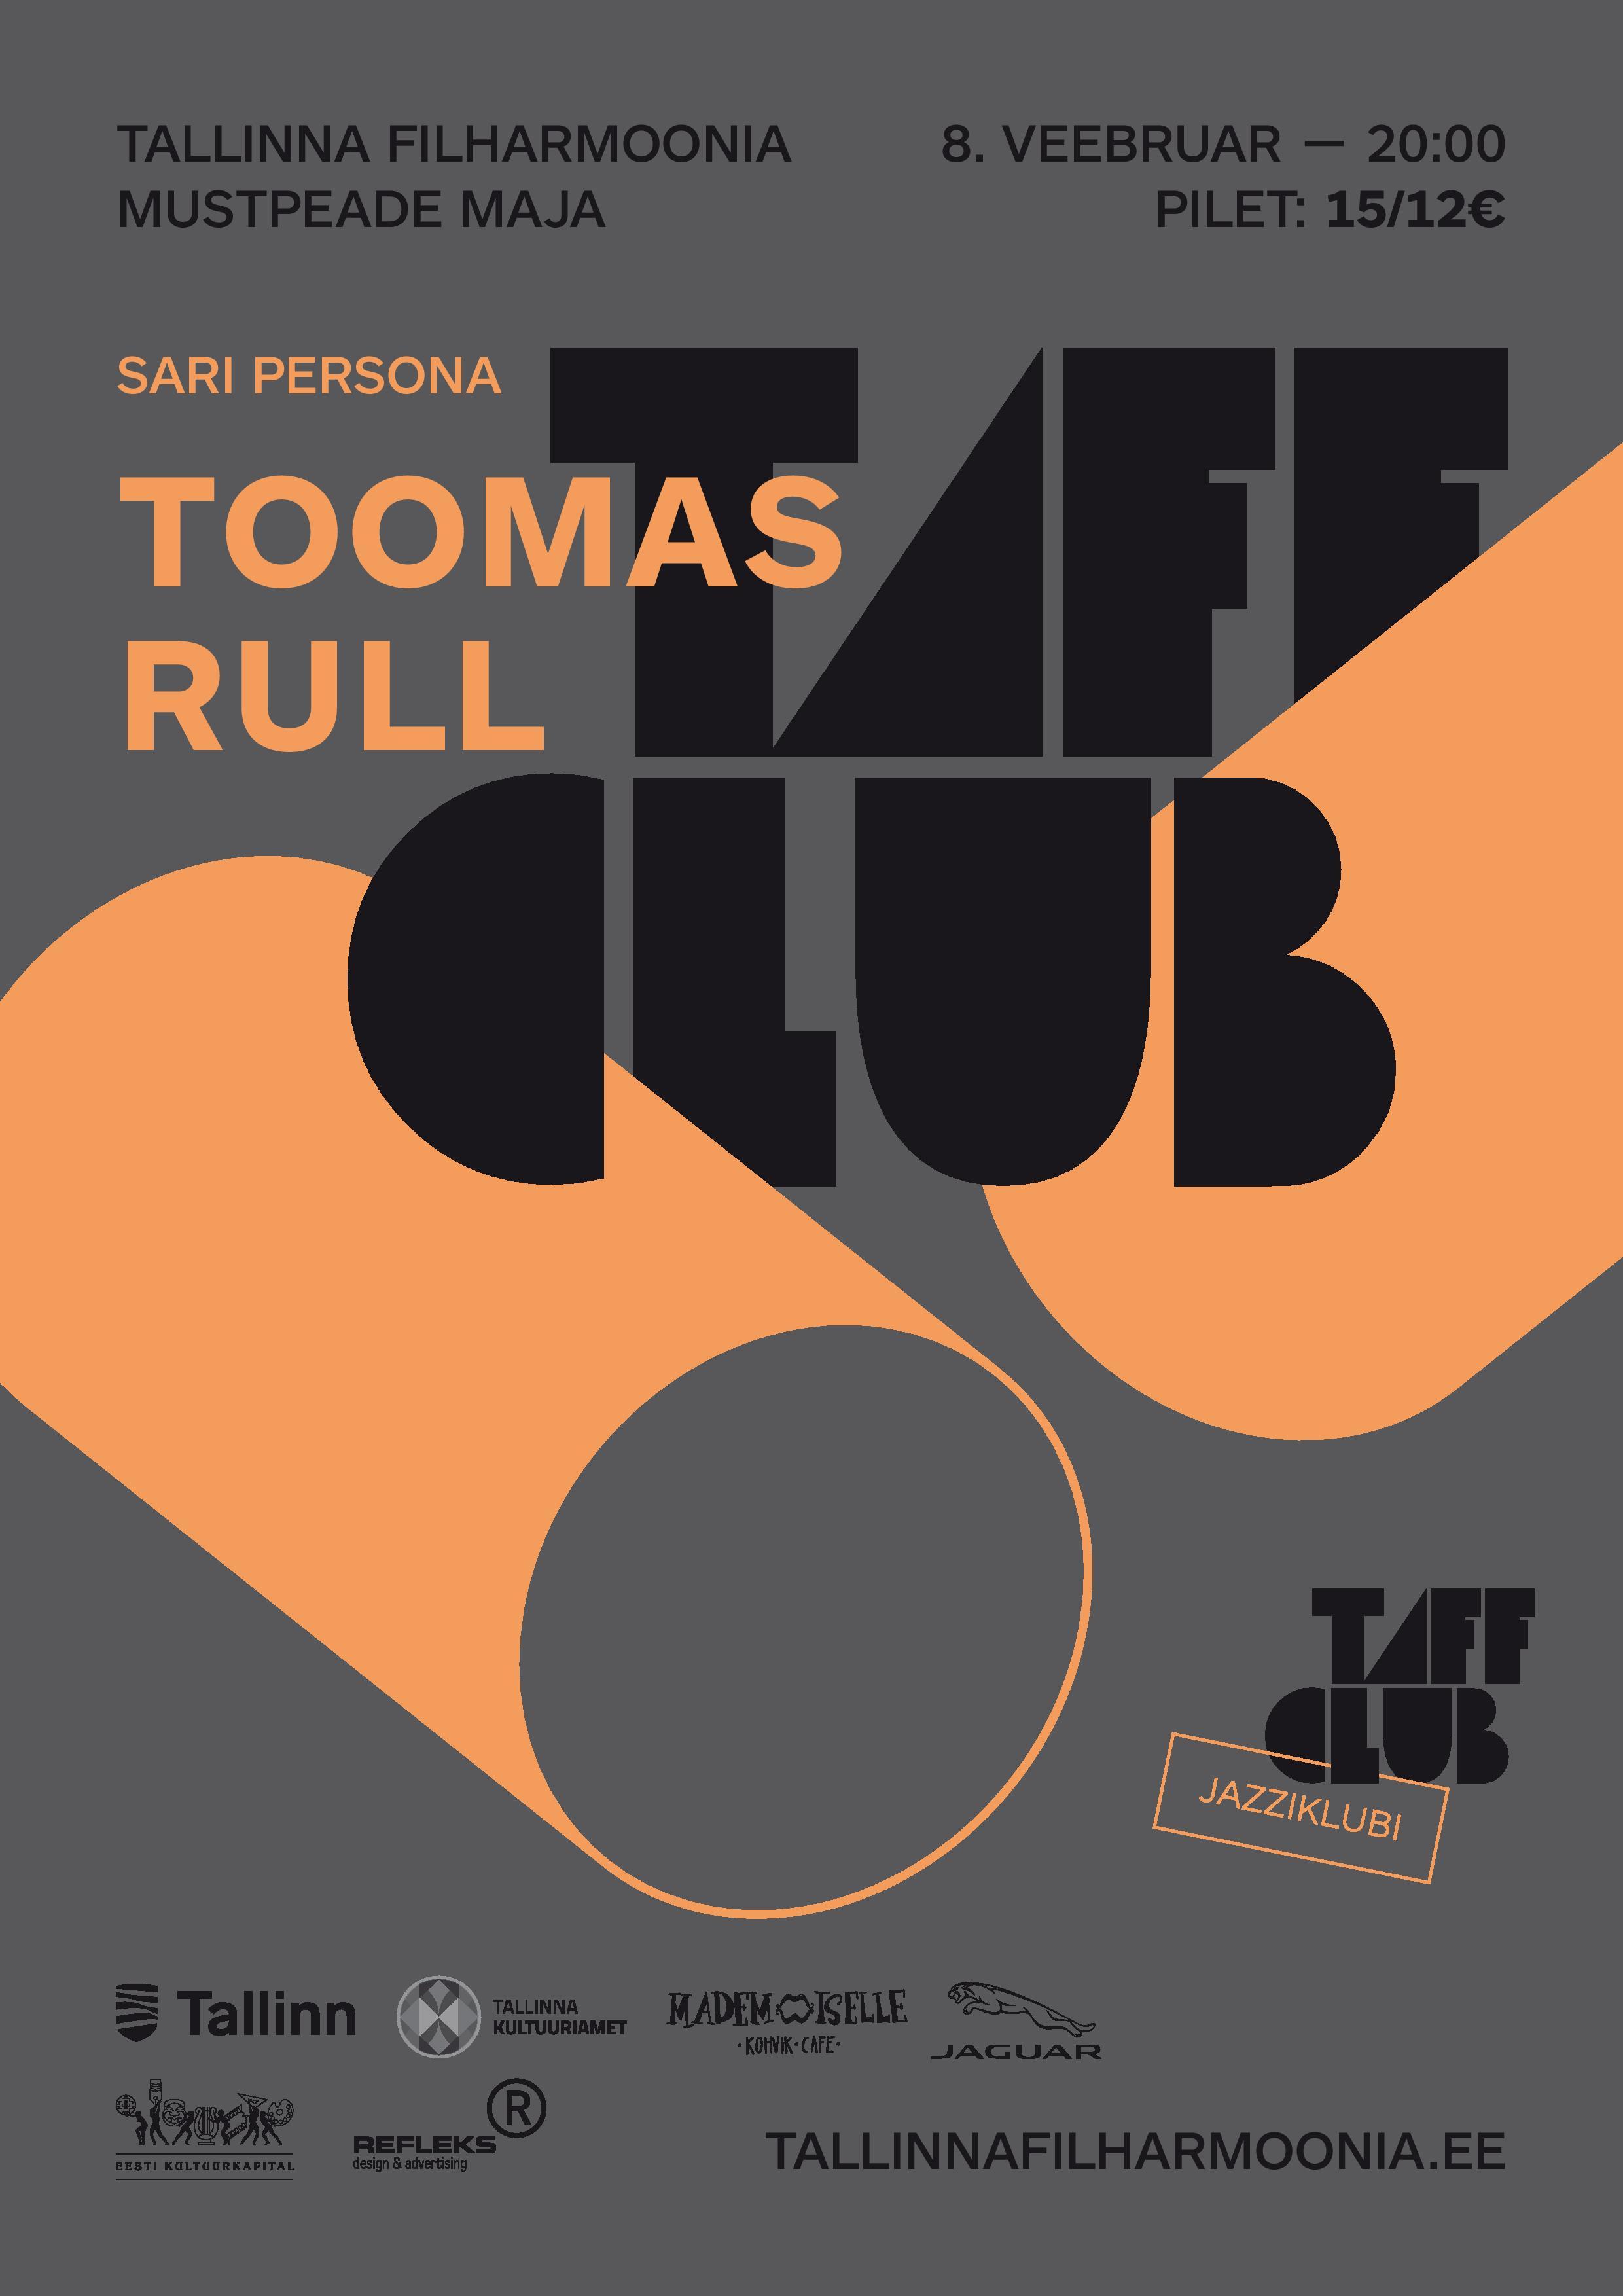 TAFF CLUB. Persona: TOOMAS RULL